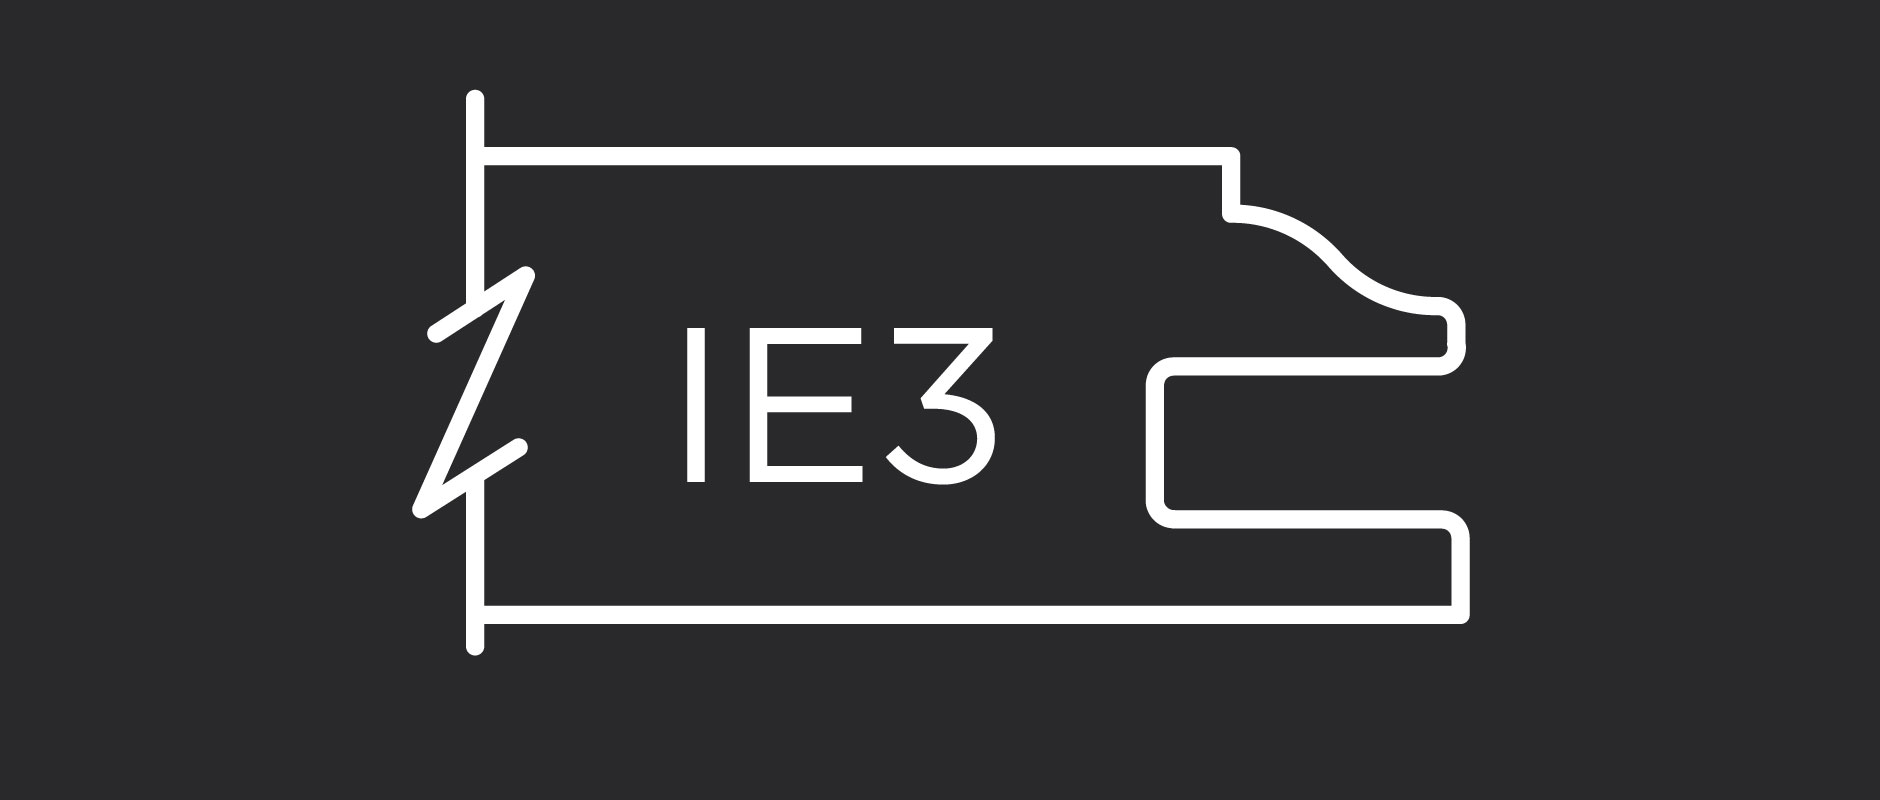 IE3 Inside Edge Profile